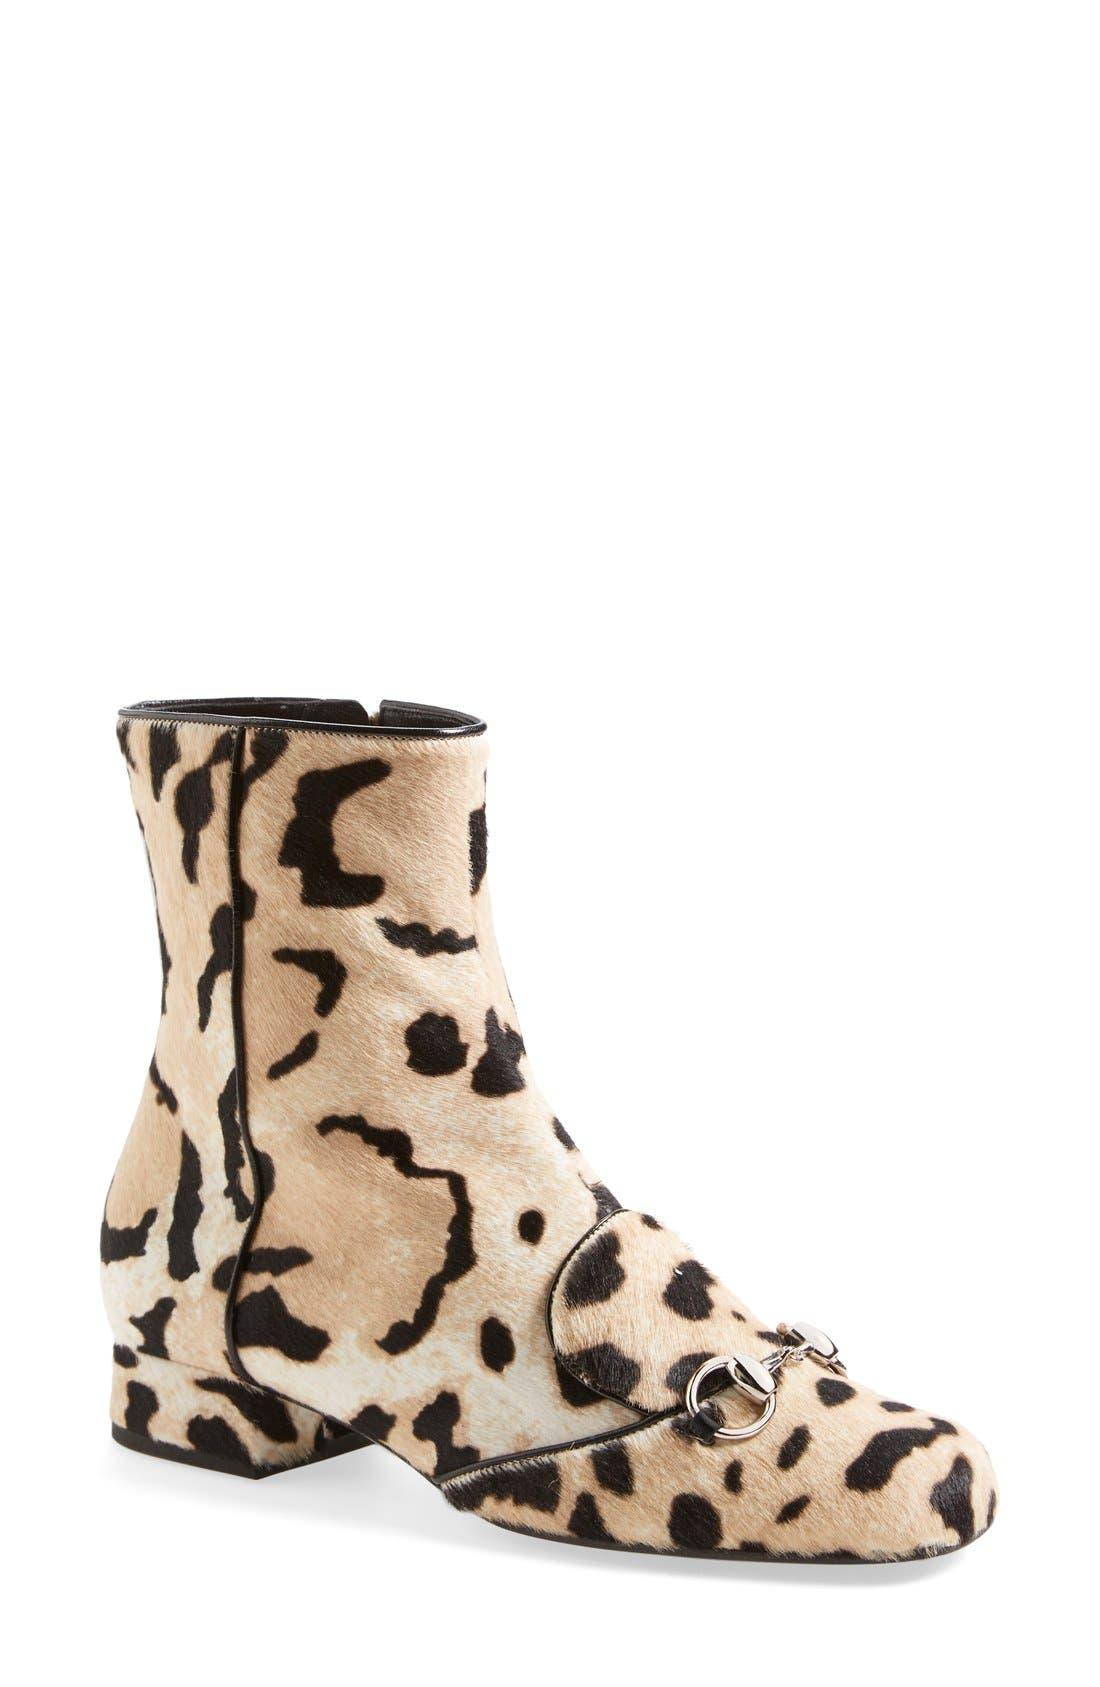 Alternate Image 1 Selected - Gucci 'Lillian' Horsebit Animal Print Calf Hair Short Bootie (Women)